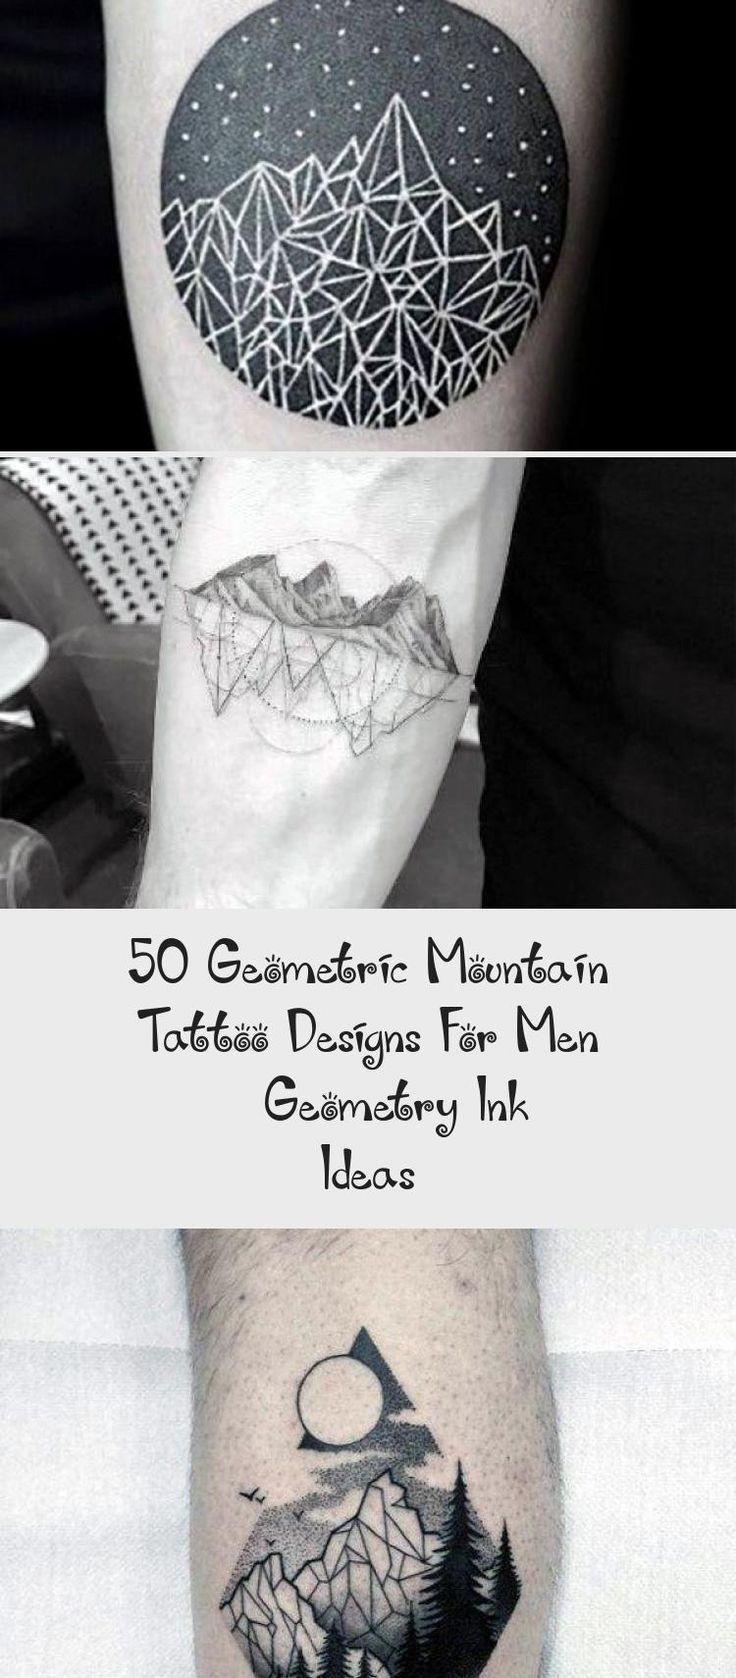 50 Geometric Mountain Tattoo Designs For Men Geometry